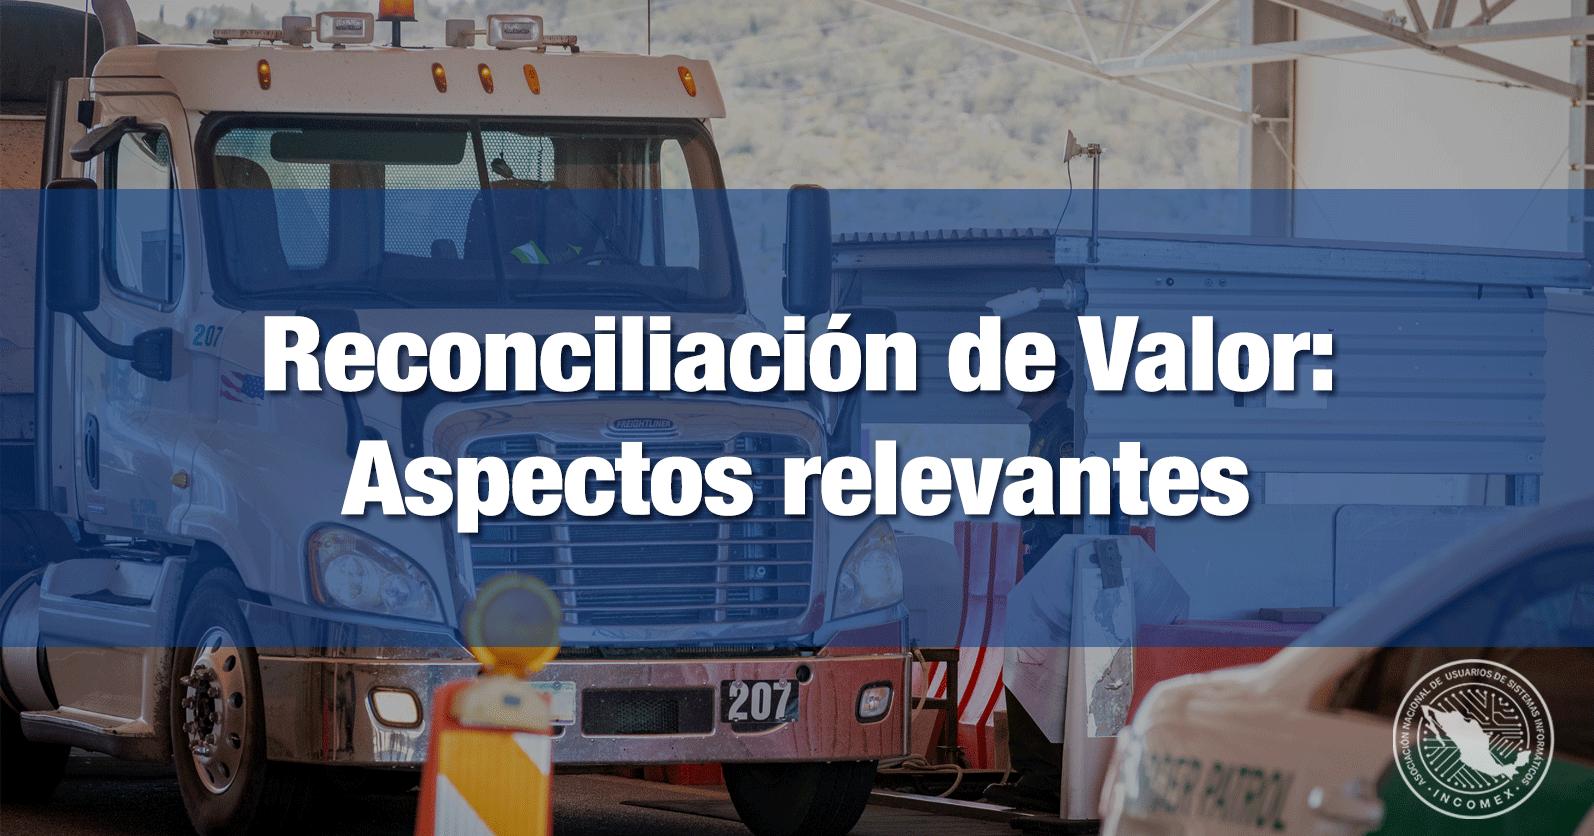 Reconciliación de Valor: Aspectos relevantes